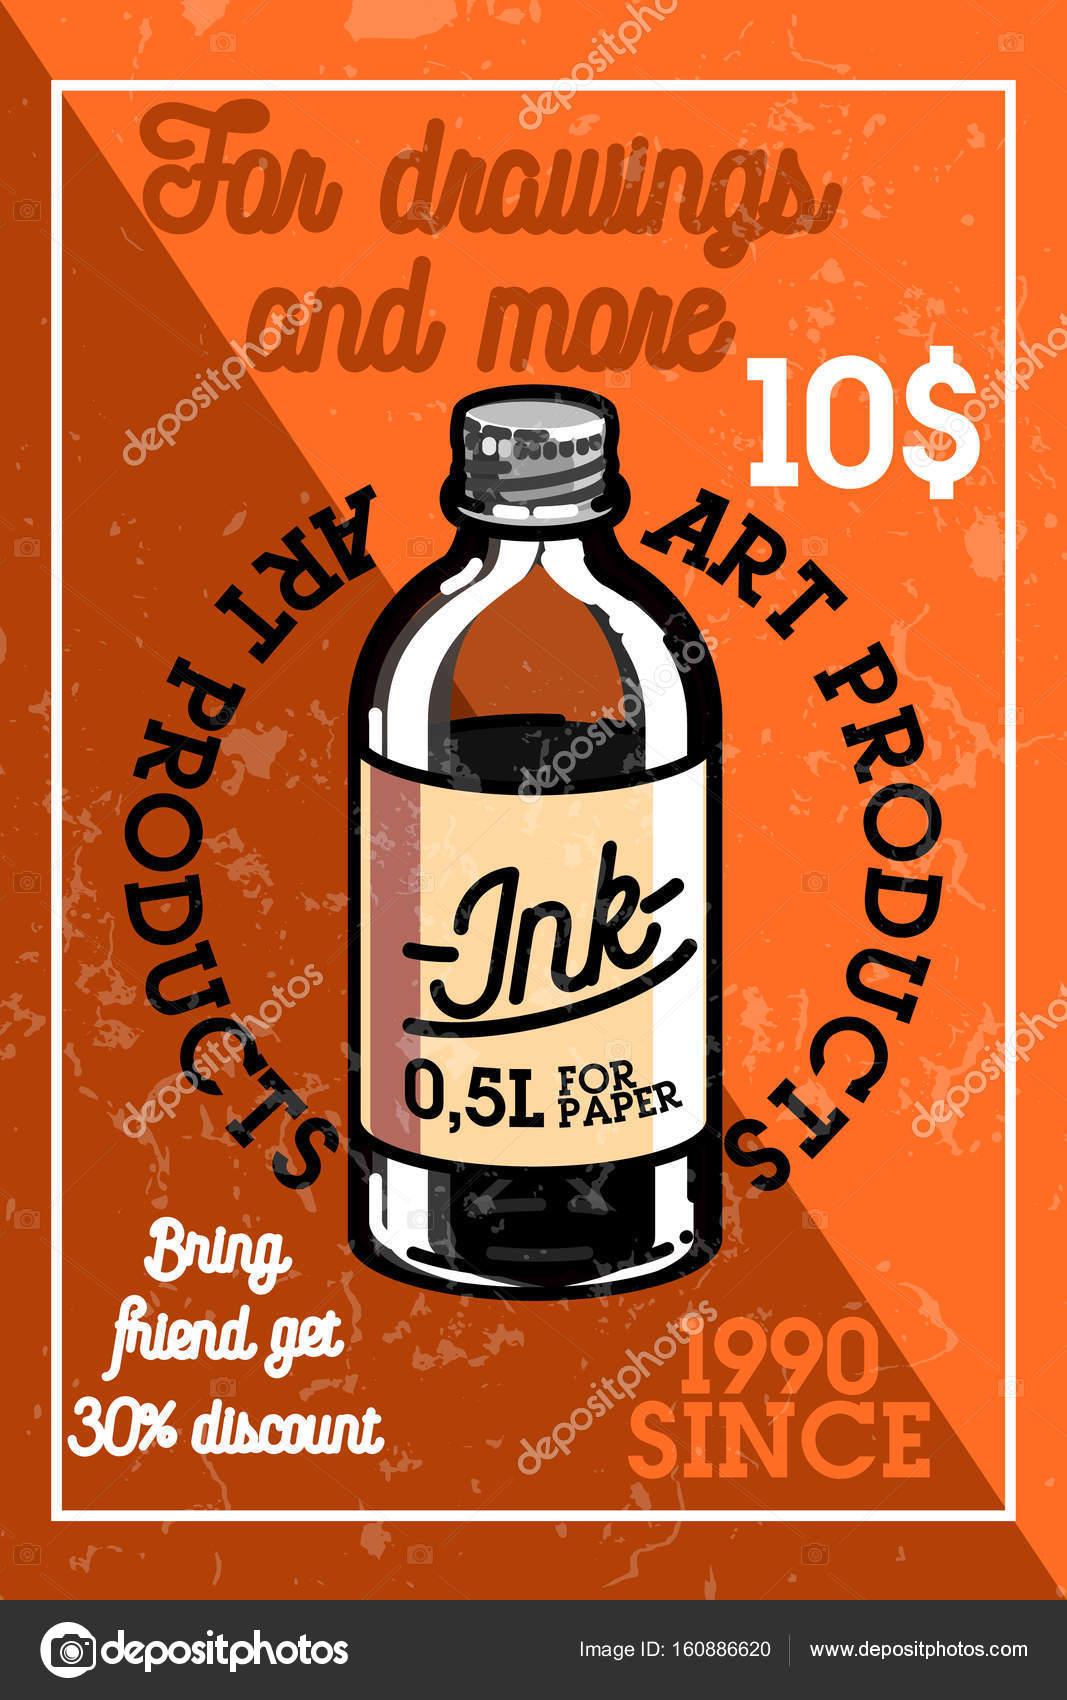 5c7979e746f Bandeira Loja Produtos Vintage Arte Cor Elementos Design Desenvolvimento  Design — Vetores de Stock